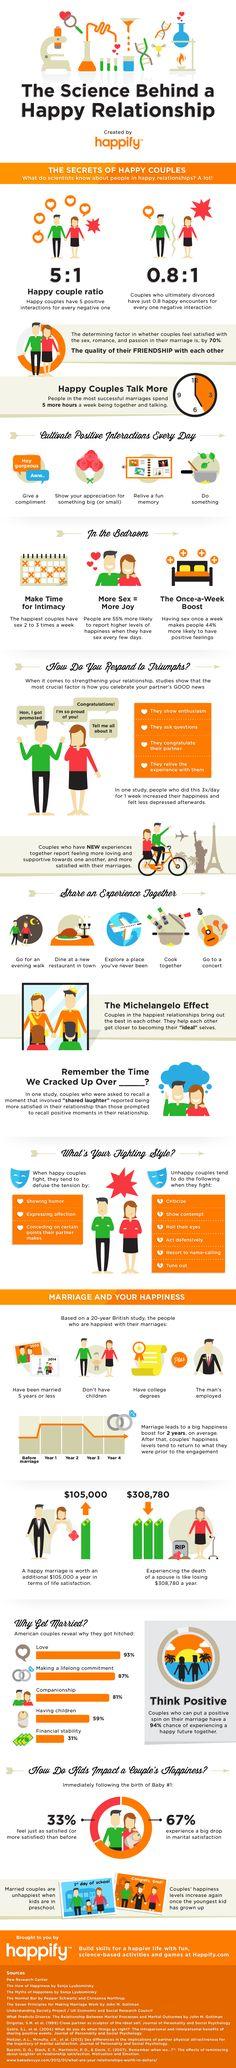 happy relationship infographic